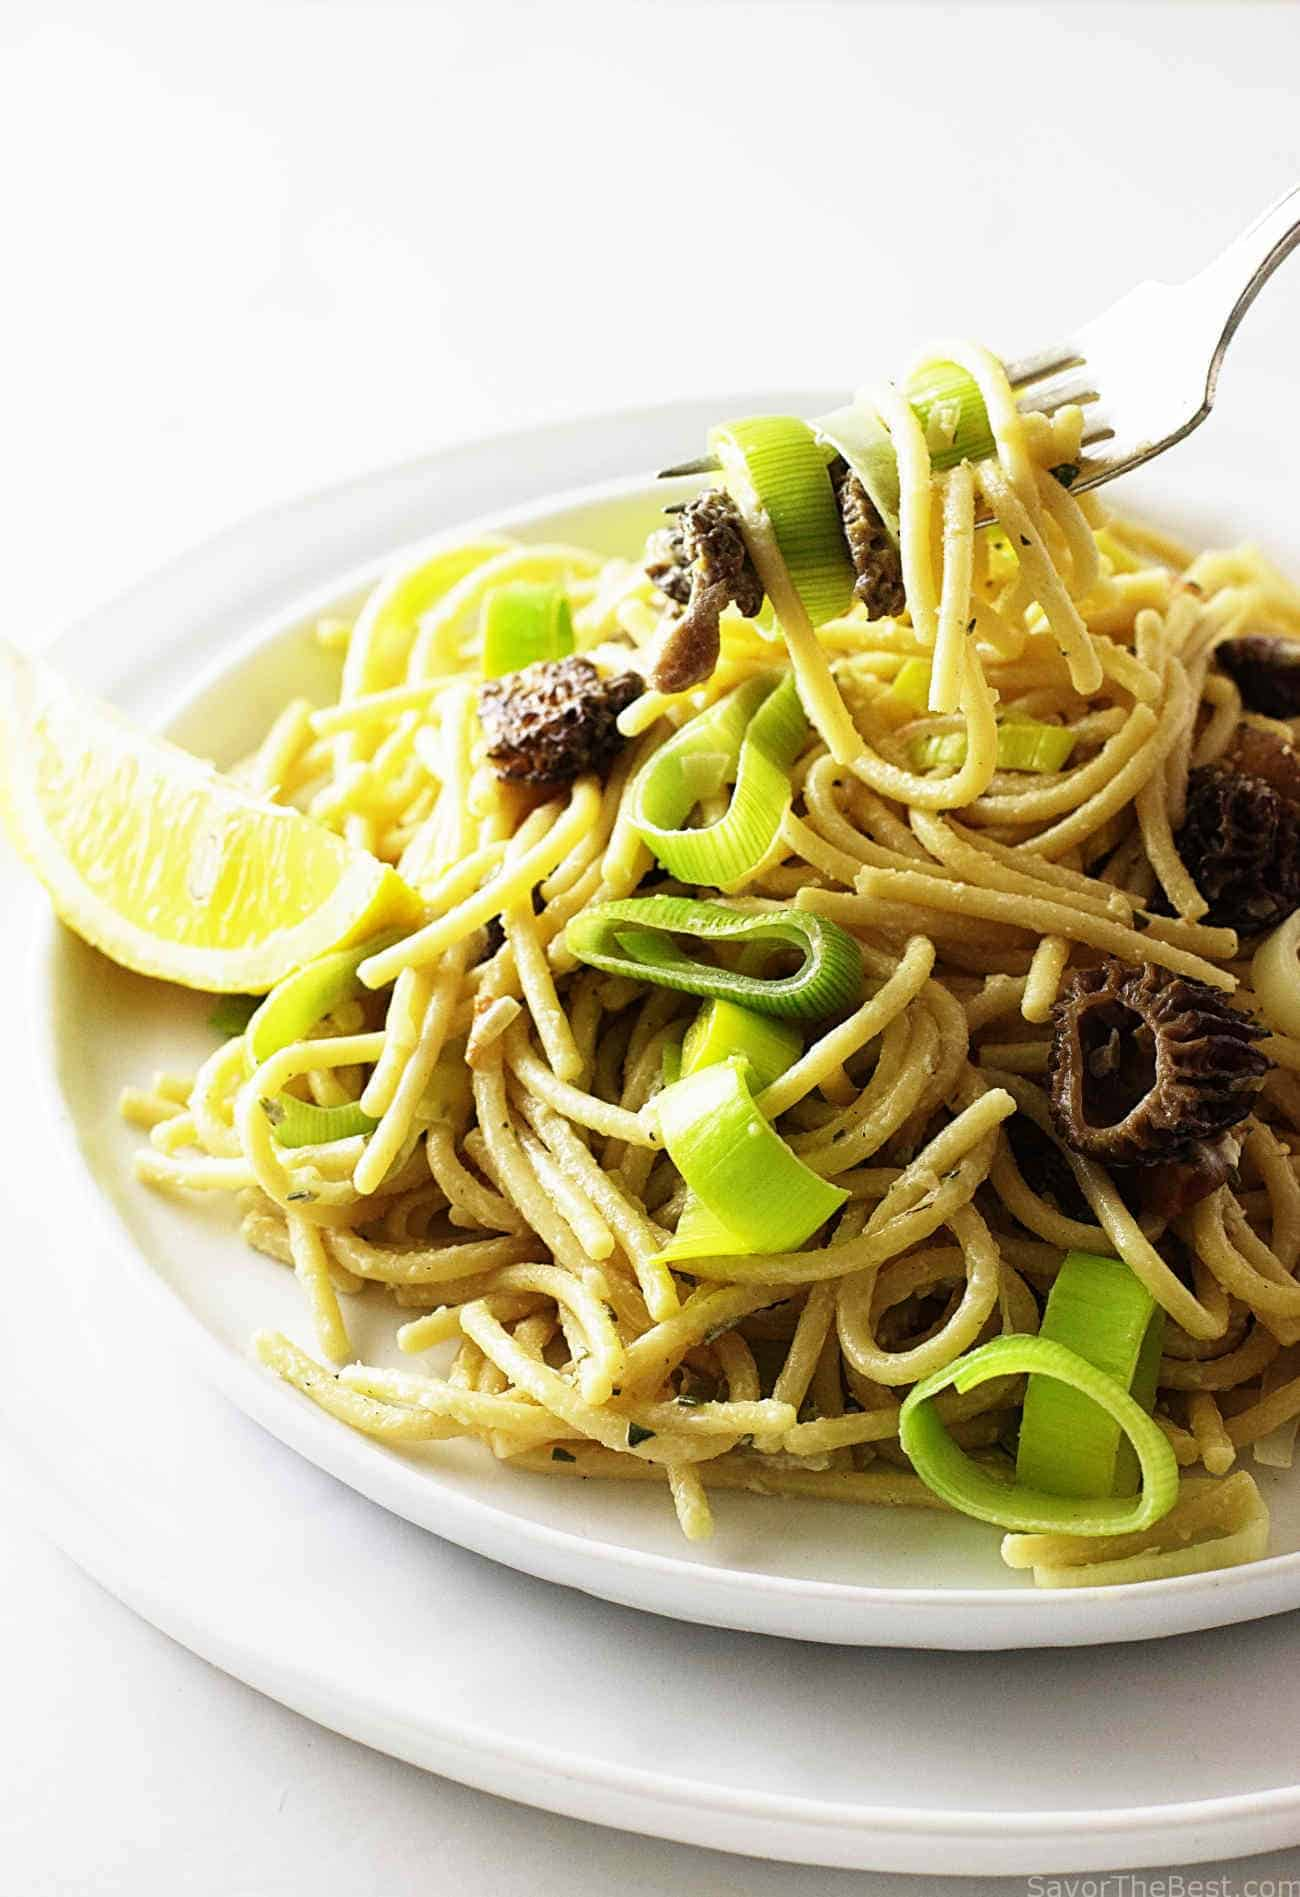 Einkorn Pasta with Morel Mushrooms